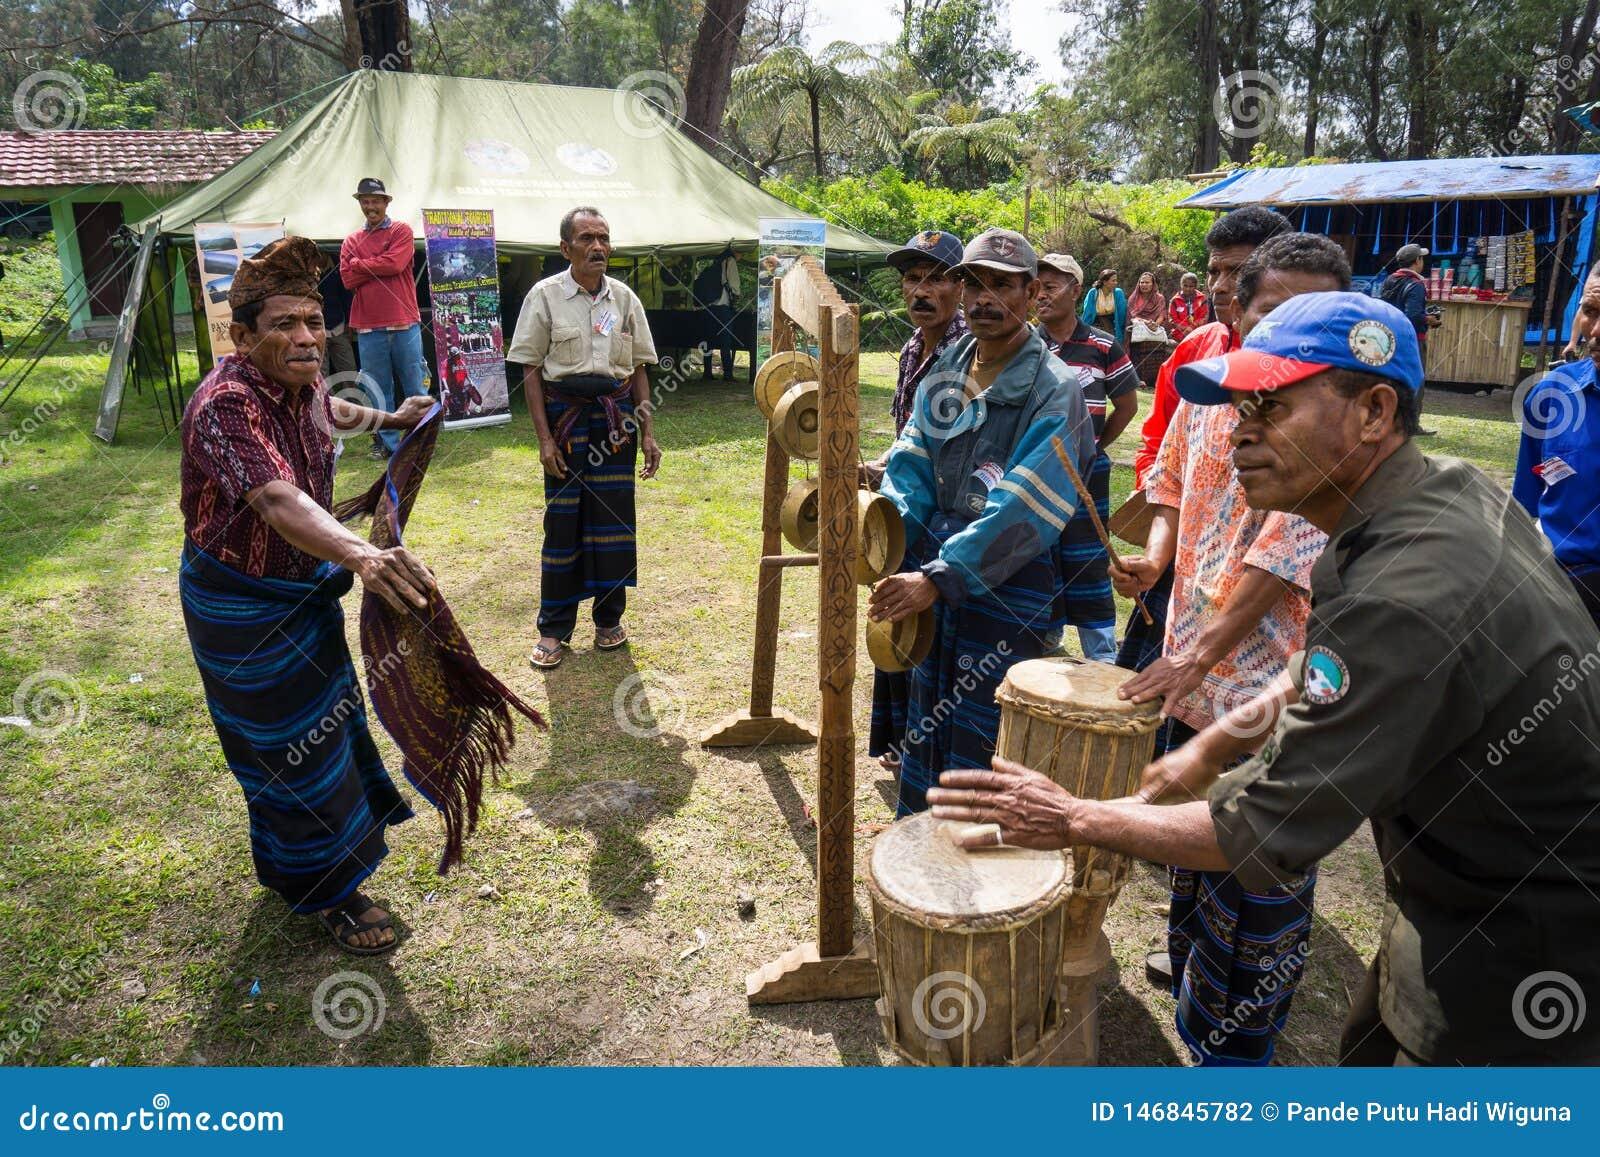 FLORES/INDONESIA-AUGUST 14 2014年:传统舞蹈和乐器从kelimutu区域ende由一个老人跳舞